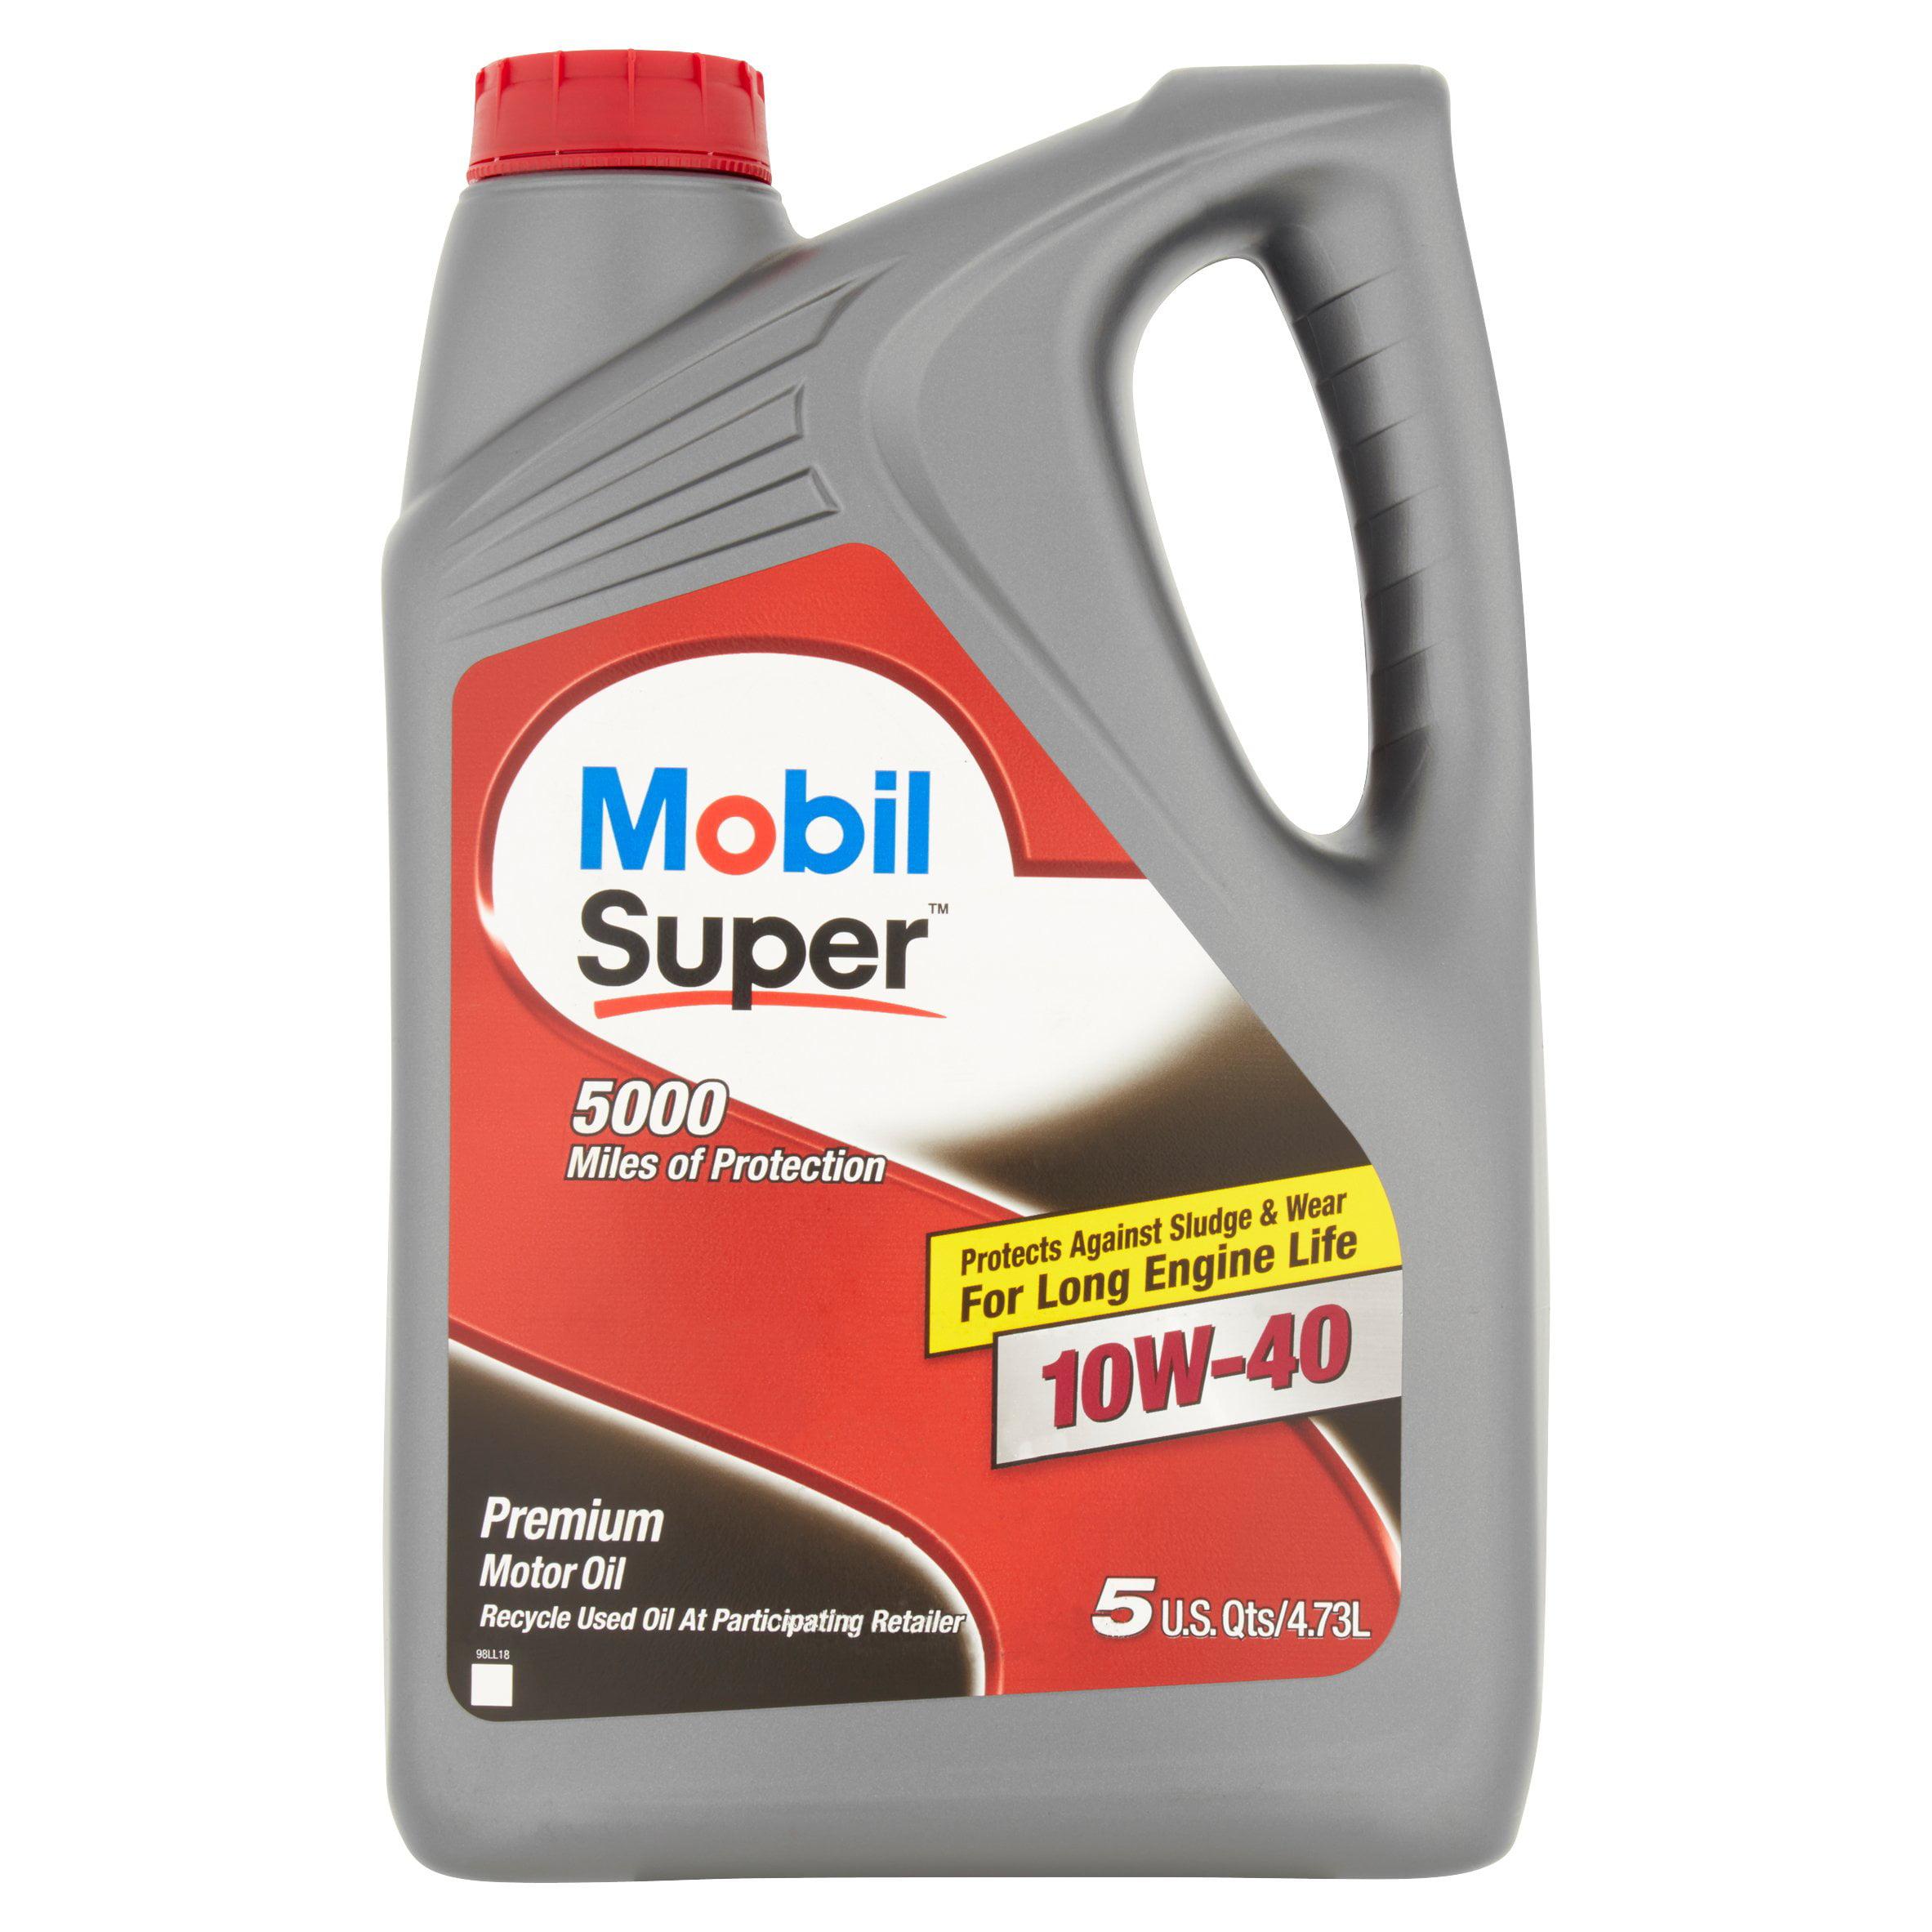 Mobil Super Premium 10W-40 Motor Oil, 5 qts